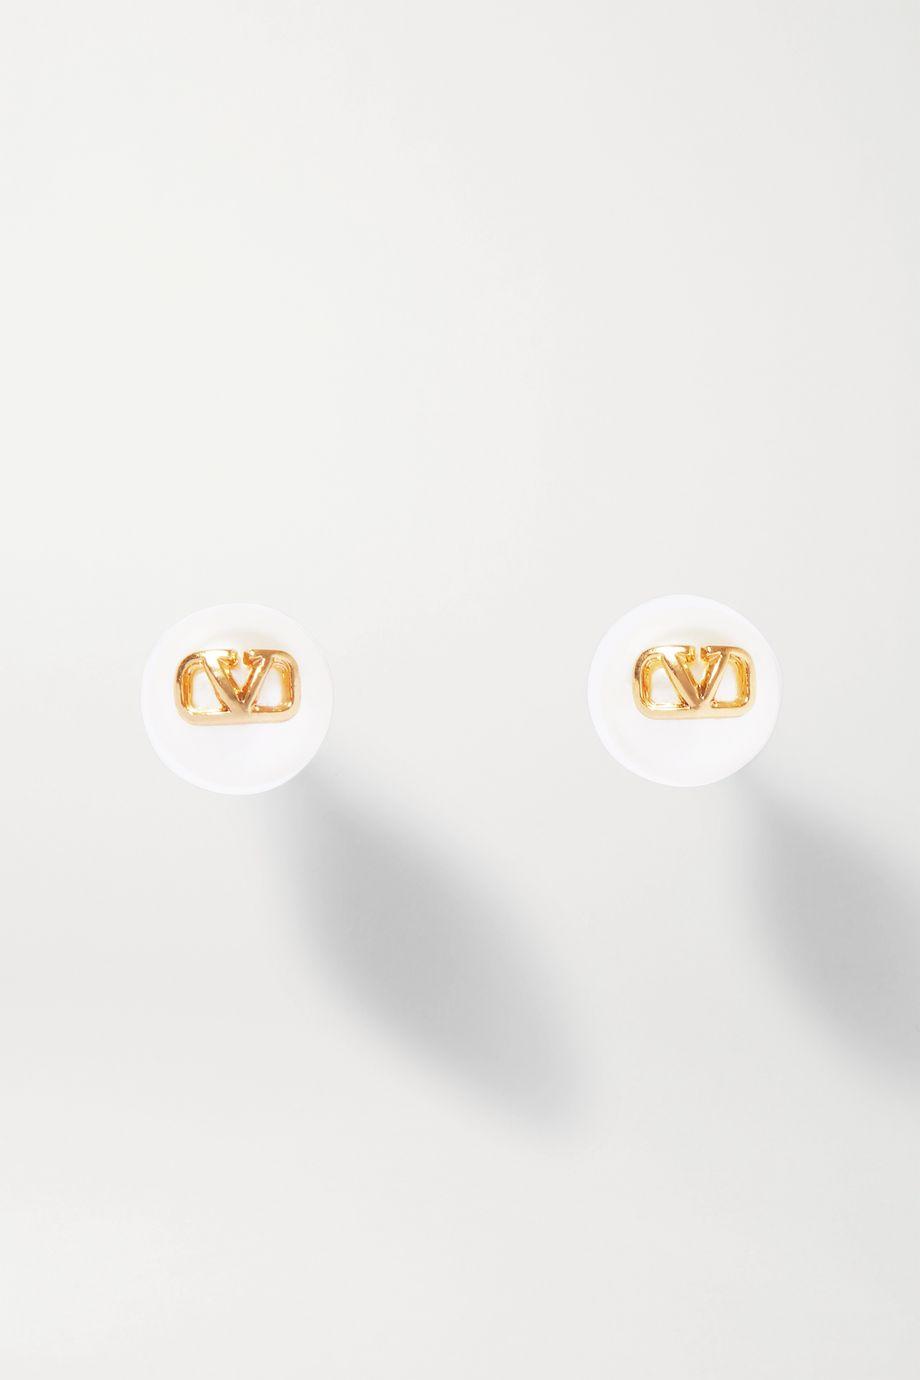 Valentino Valentino Garavani goldfarbene Ohrringe mit Kunstperlen